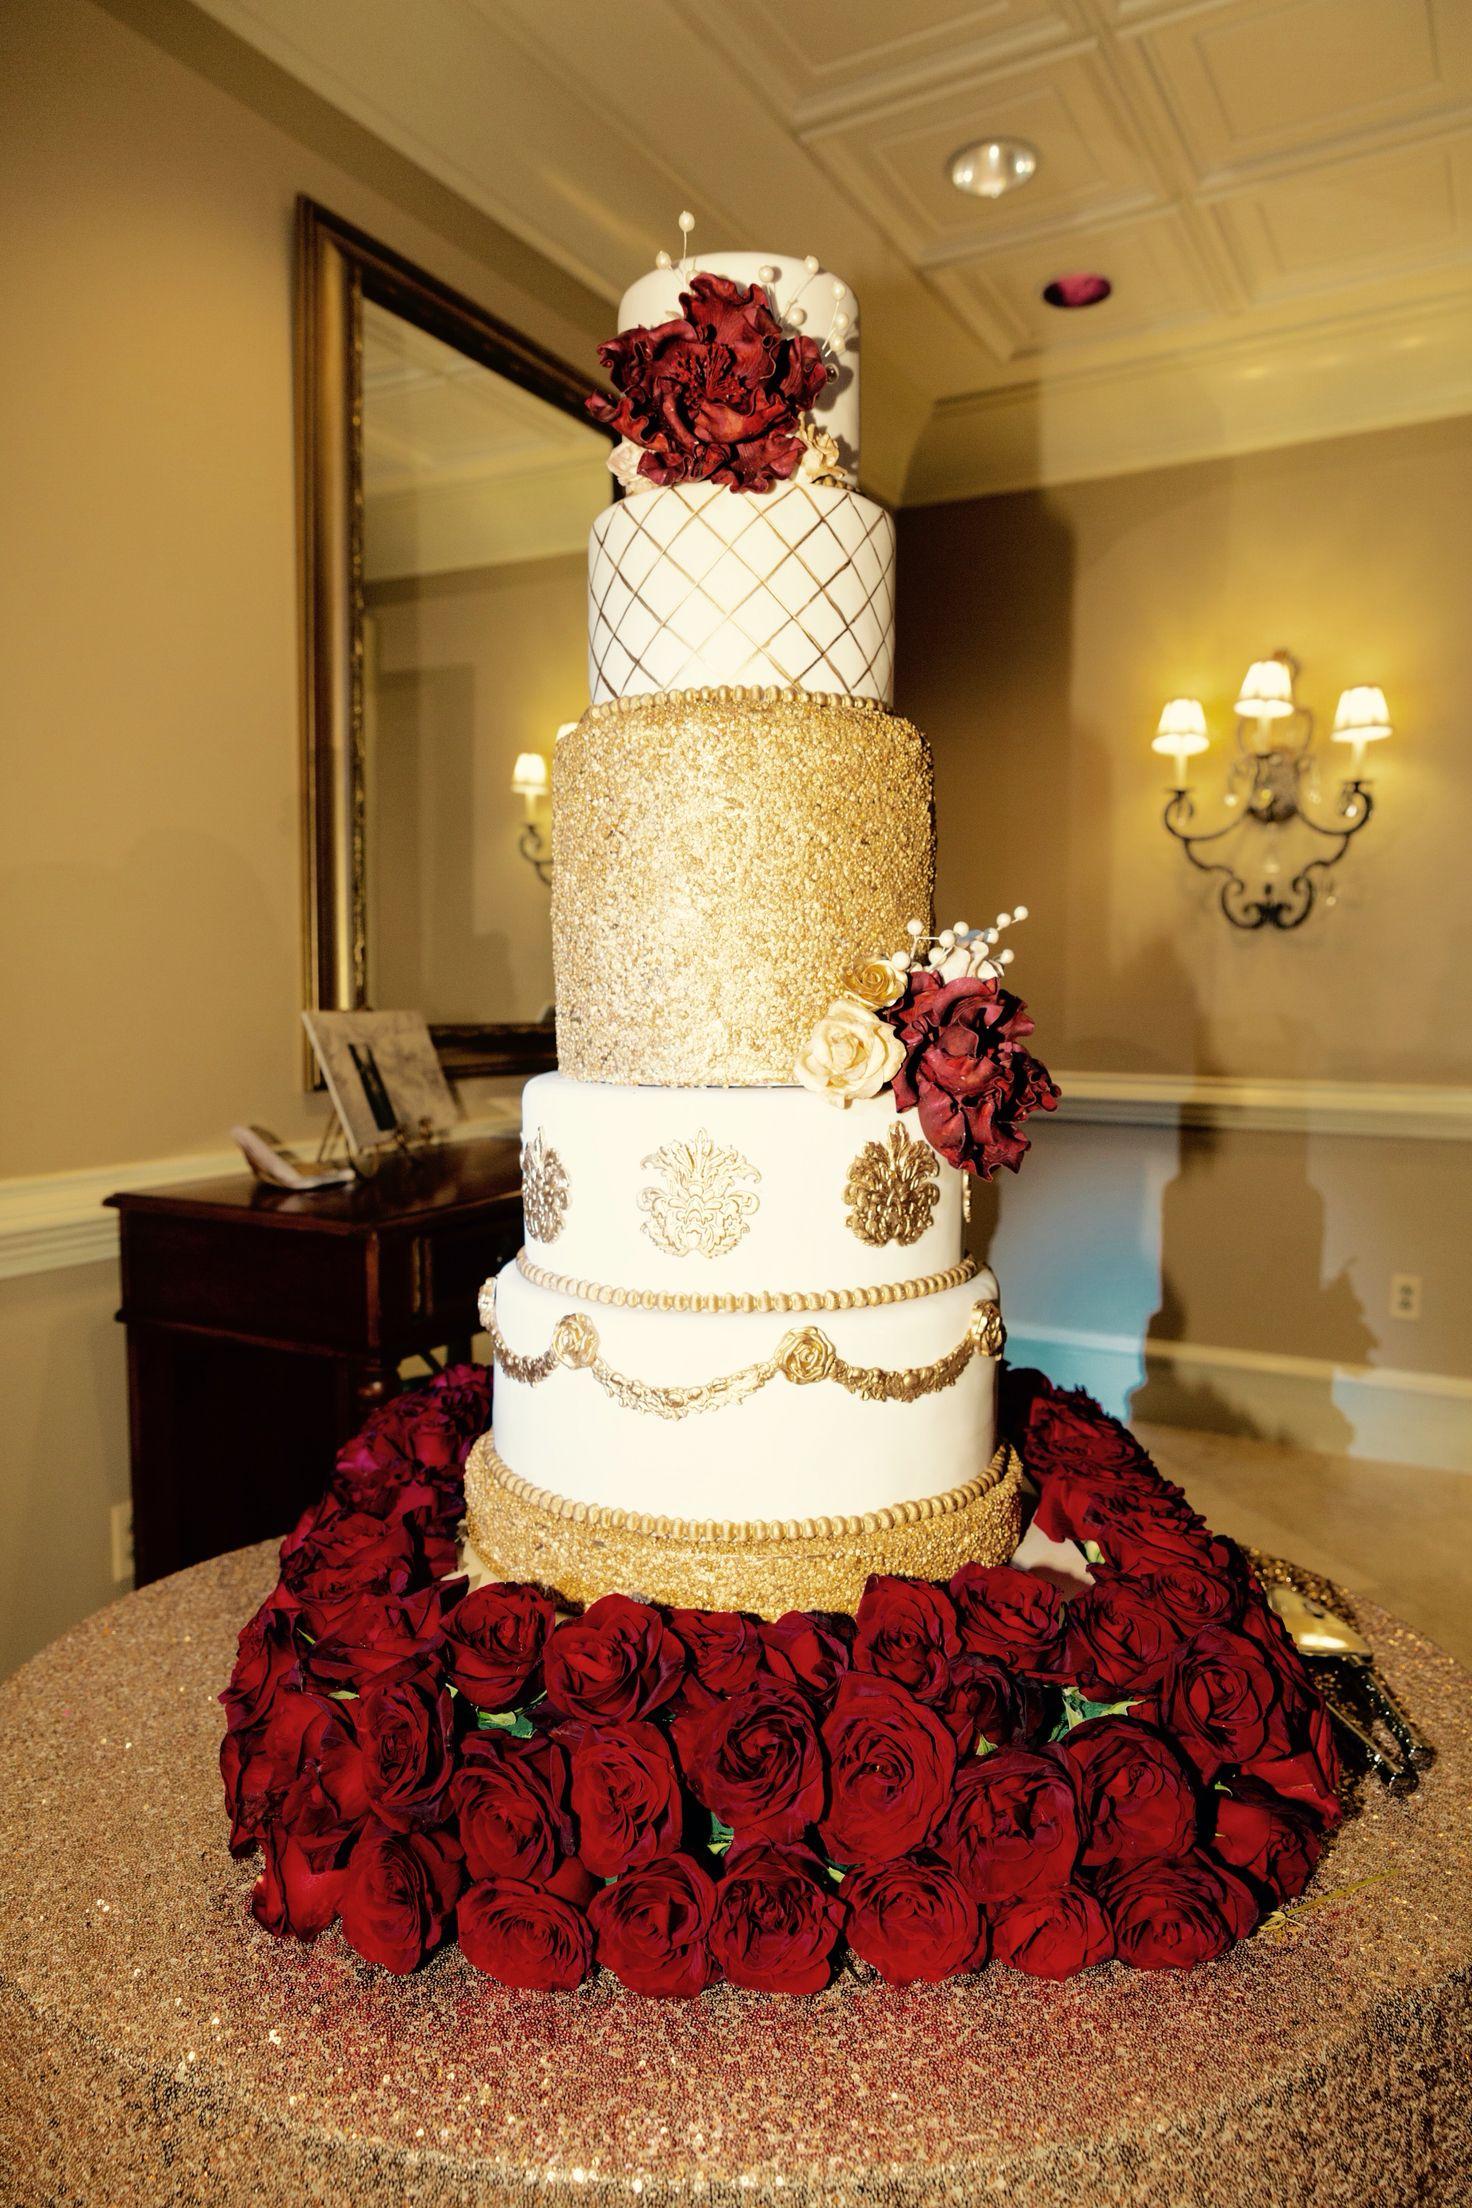 An amazing 5-tier gold and burgundy fondant wedding cake ...